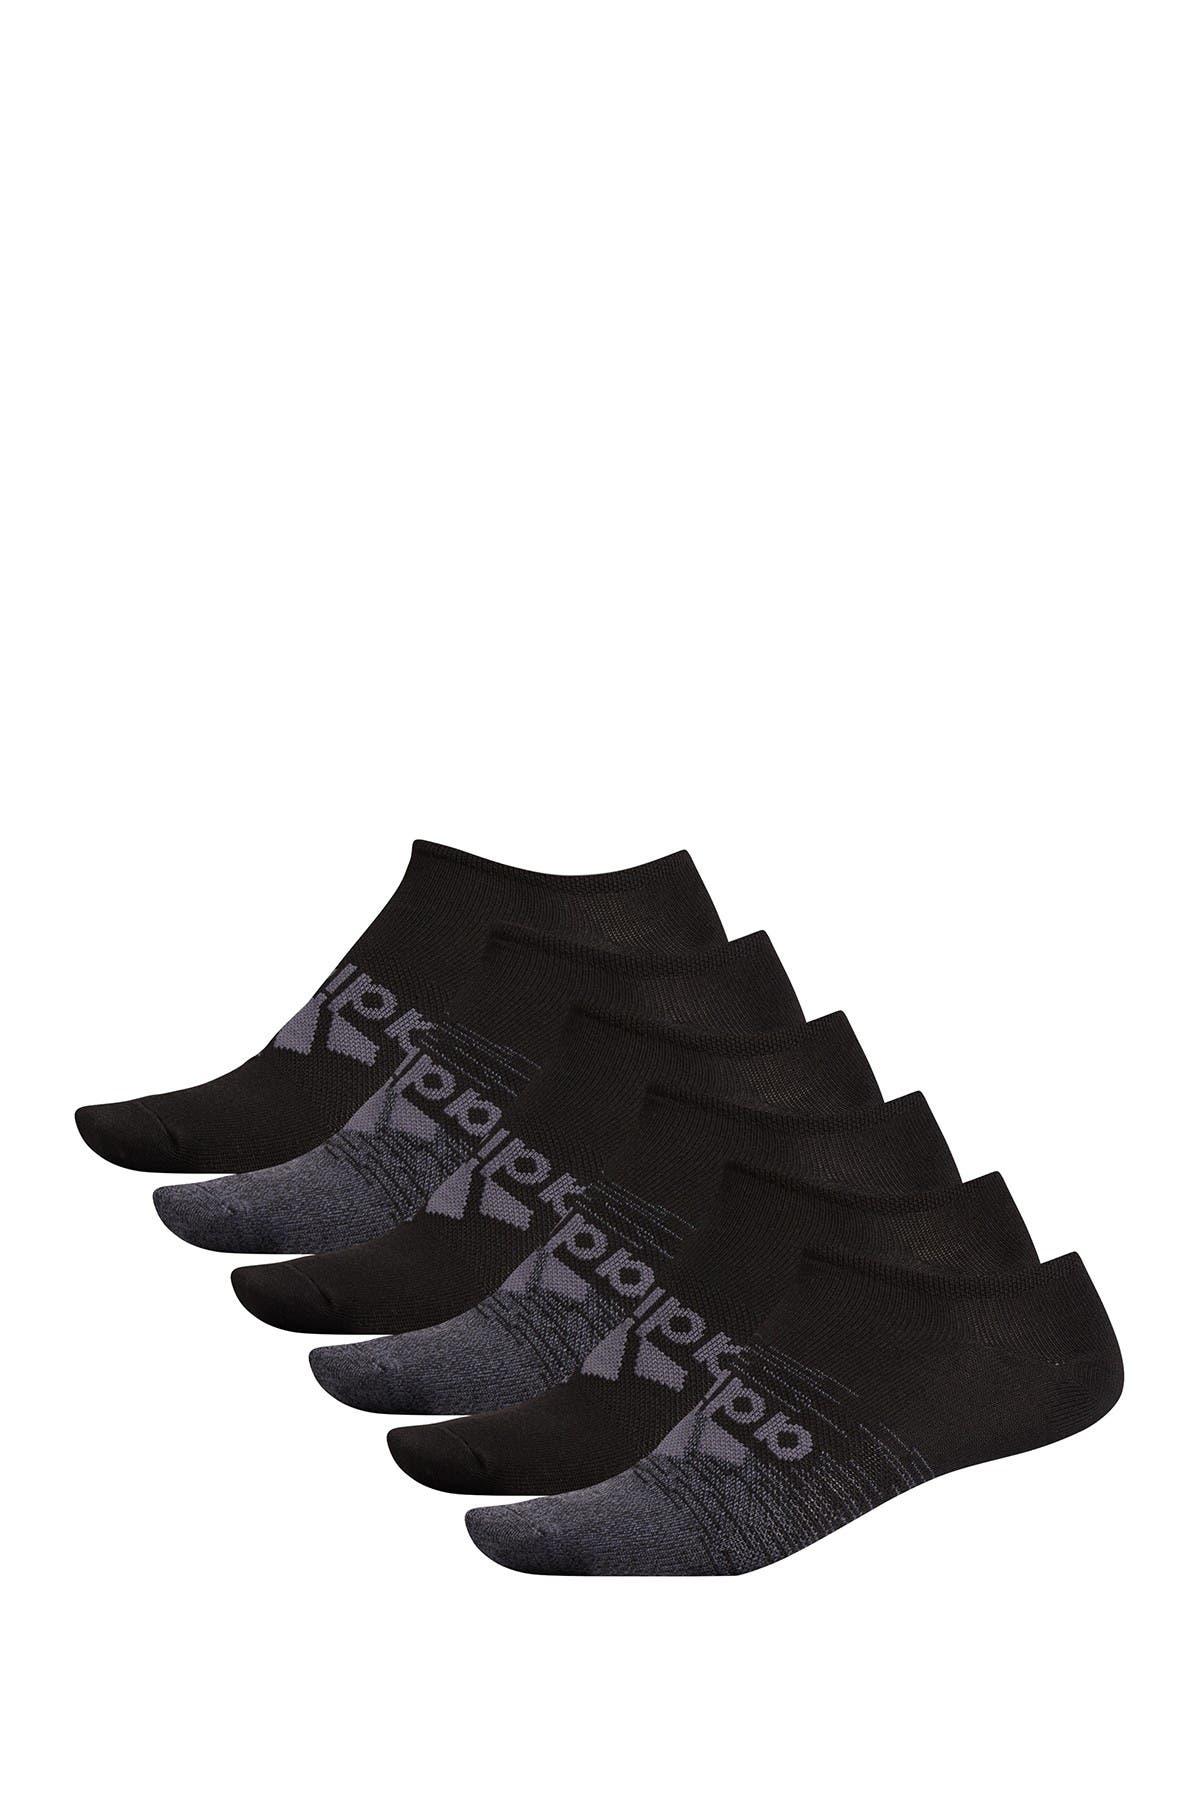 Image of adidas Superlite Low Cut Socks - Pack of 6